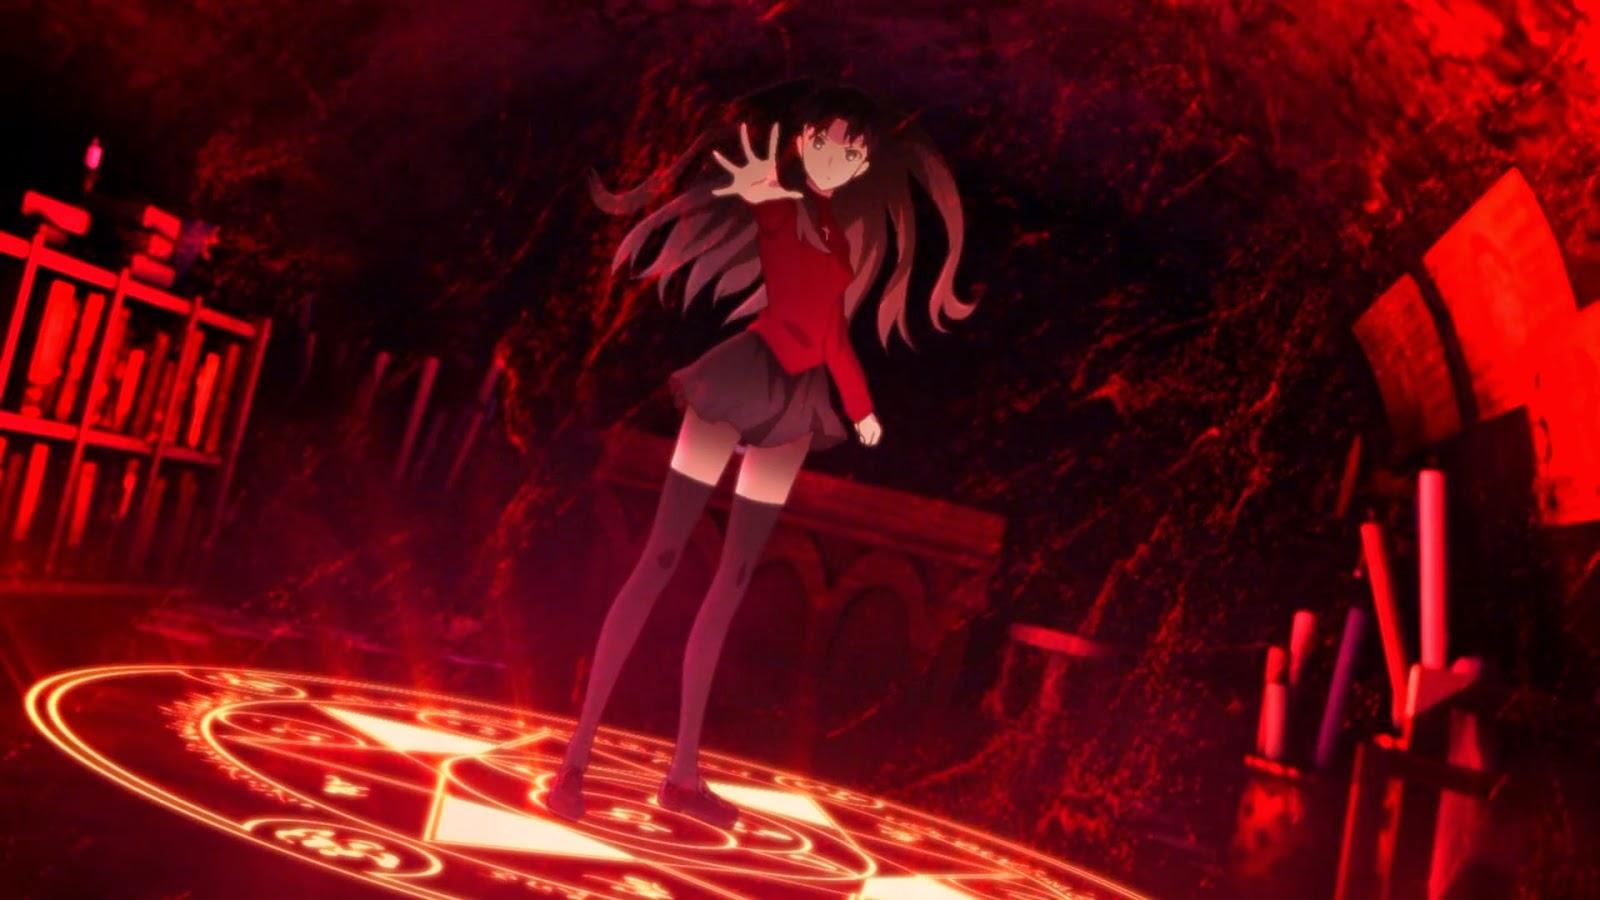 Rin Tohsaka Sedang Melakukan Pemanggilan Servant